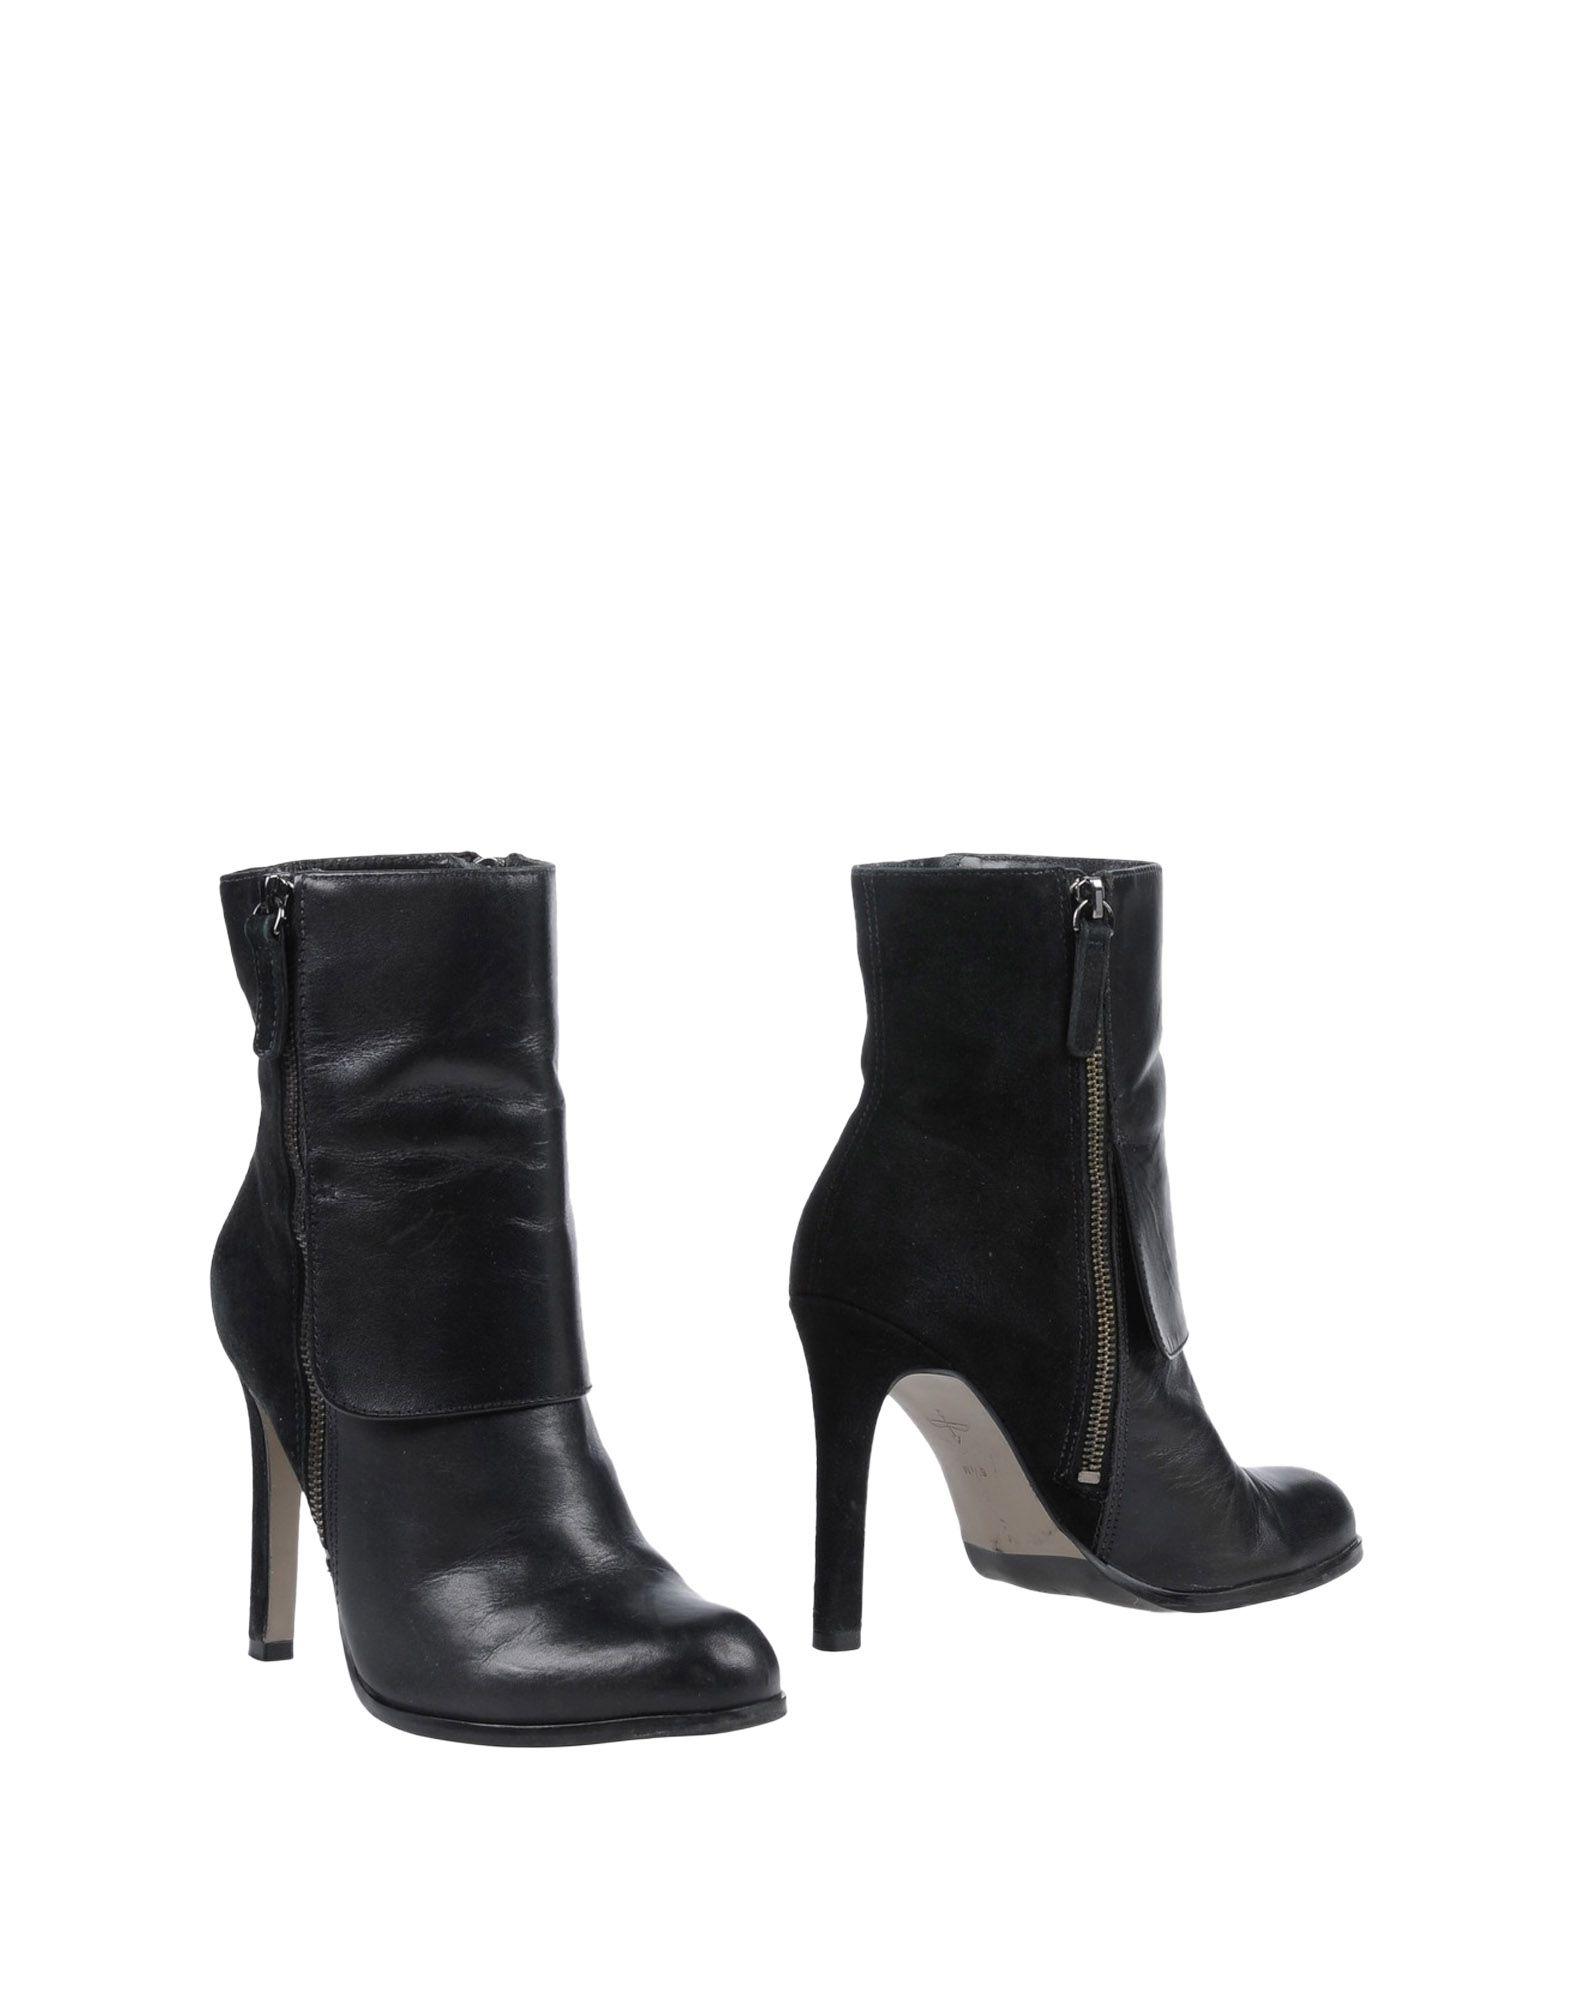 Pour La Victoire Stiefelette Damen aussehende  11447498SLGut aussehende Damen strapazierfähige Schuhe 885531